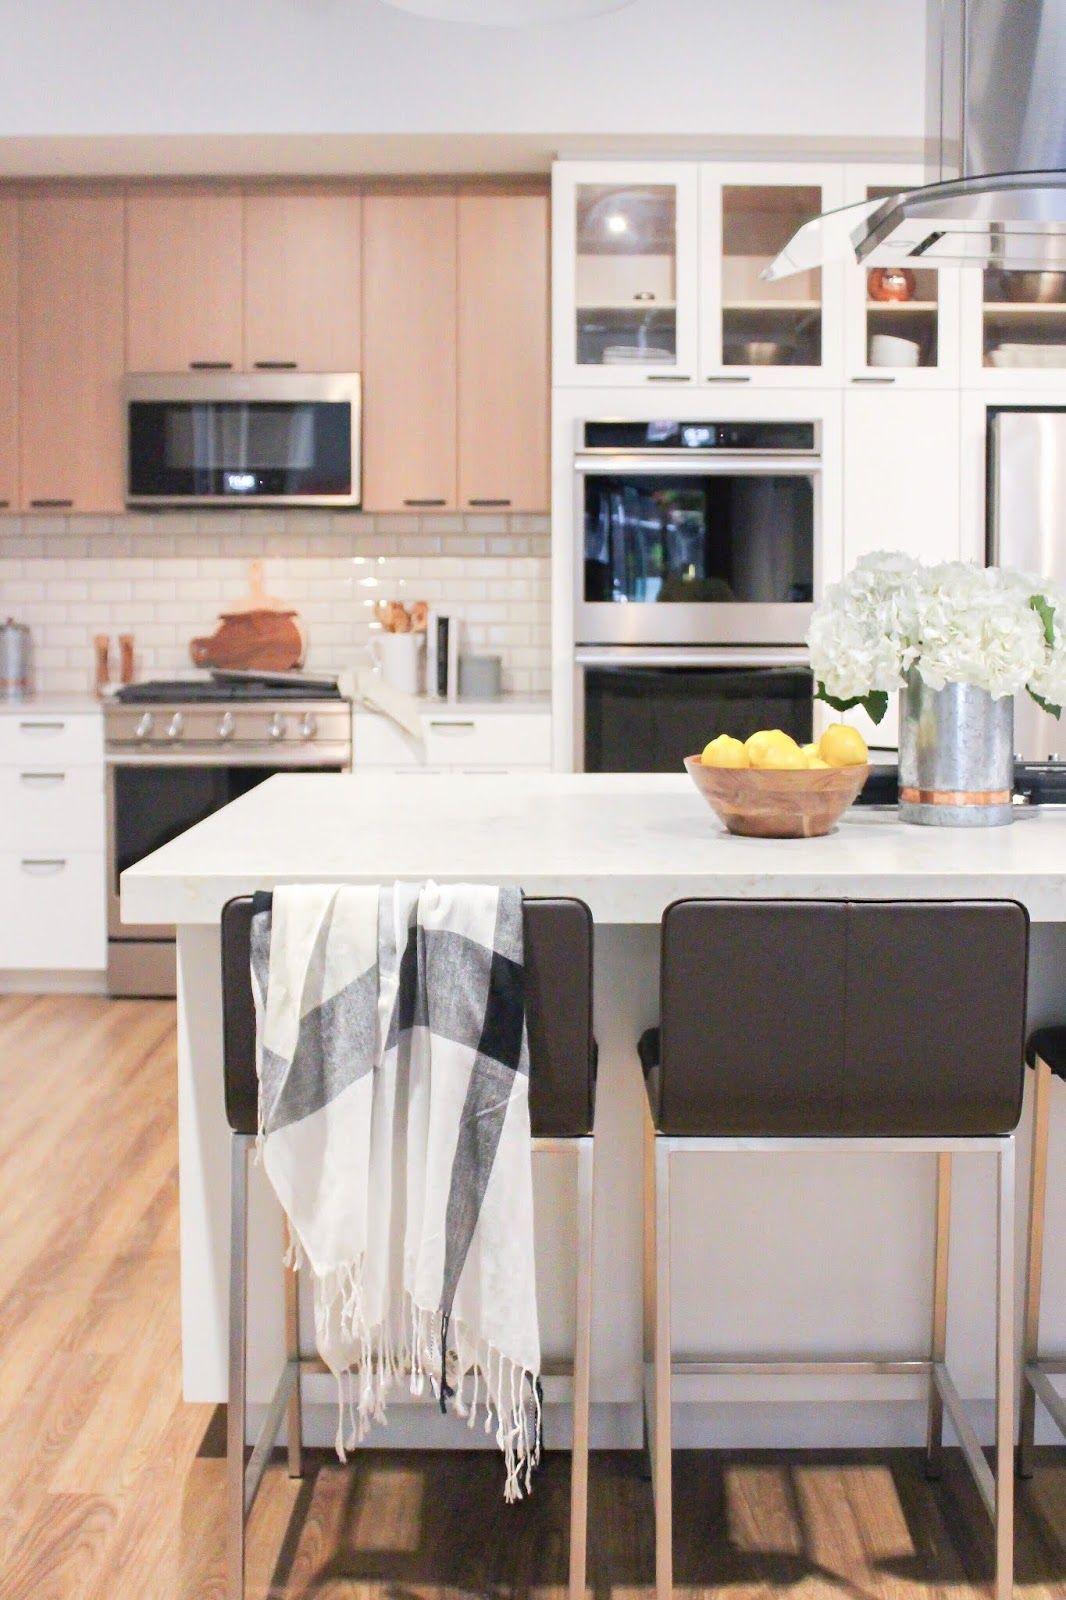 kitchen must haves kitchen must haves kitchen kitchen styling on kitchen remodel must haves id=39307